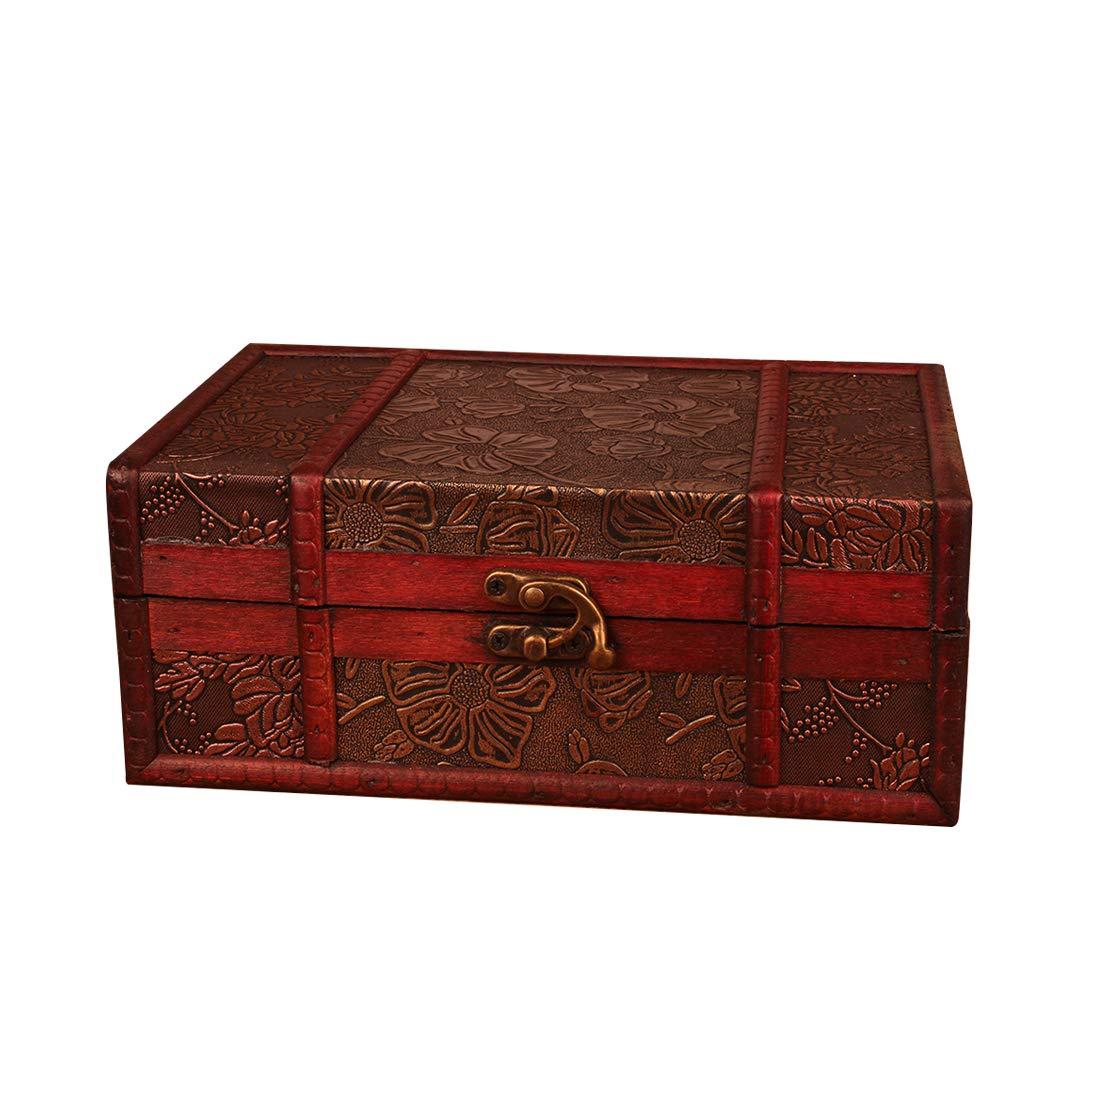 Lingxuinfo Wooden Jewellery Box Dressing Case Keepsake Box with Lock for Decor